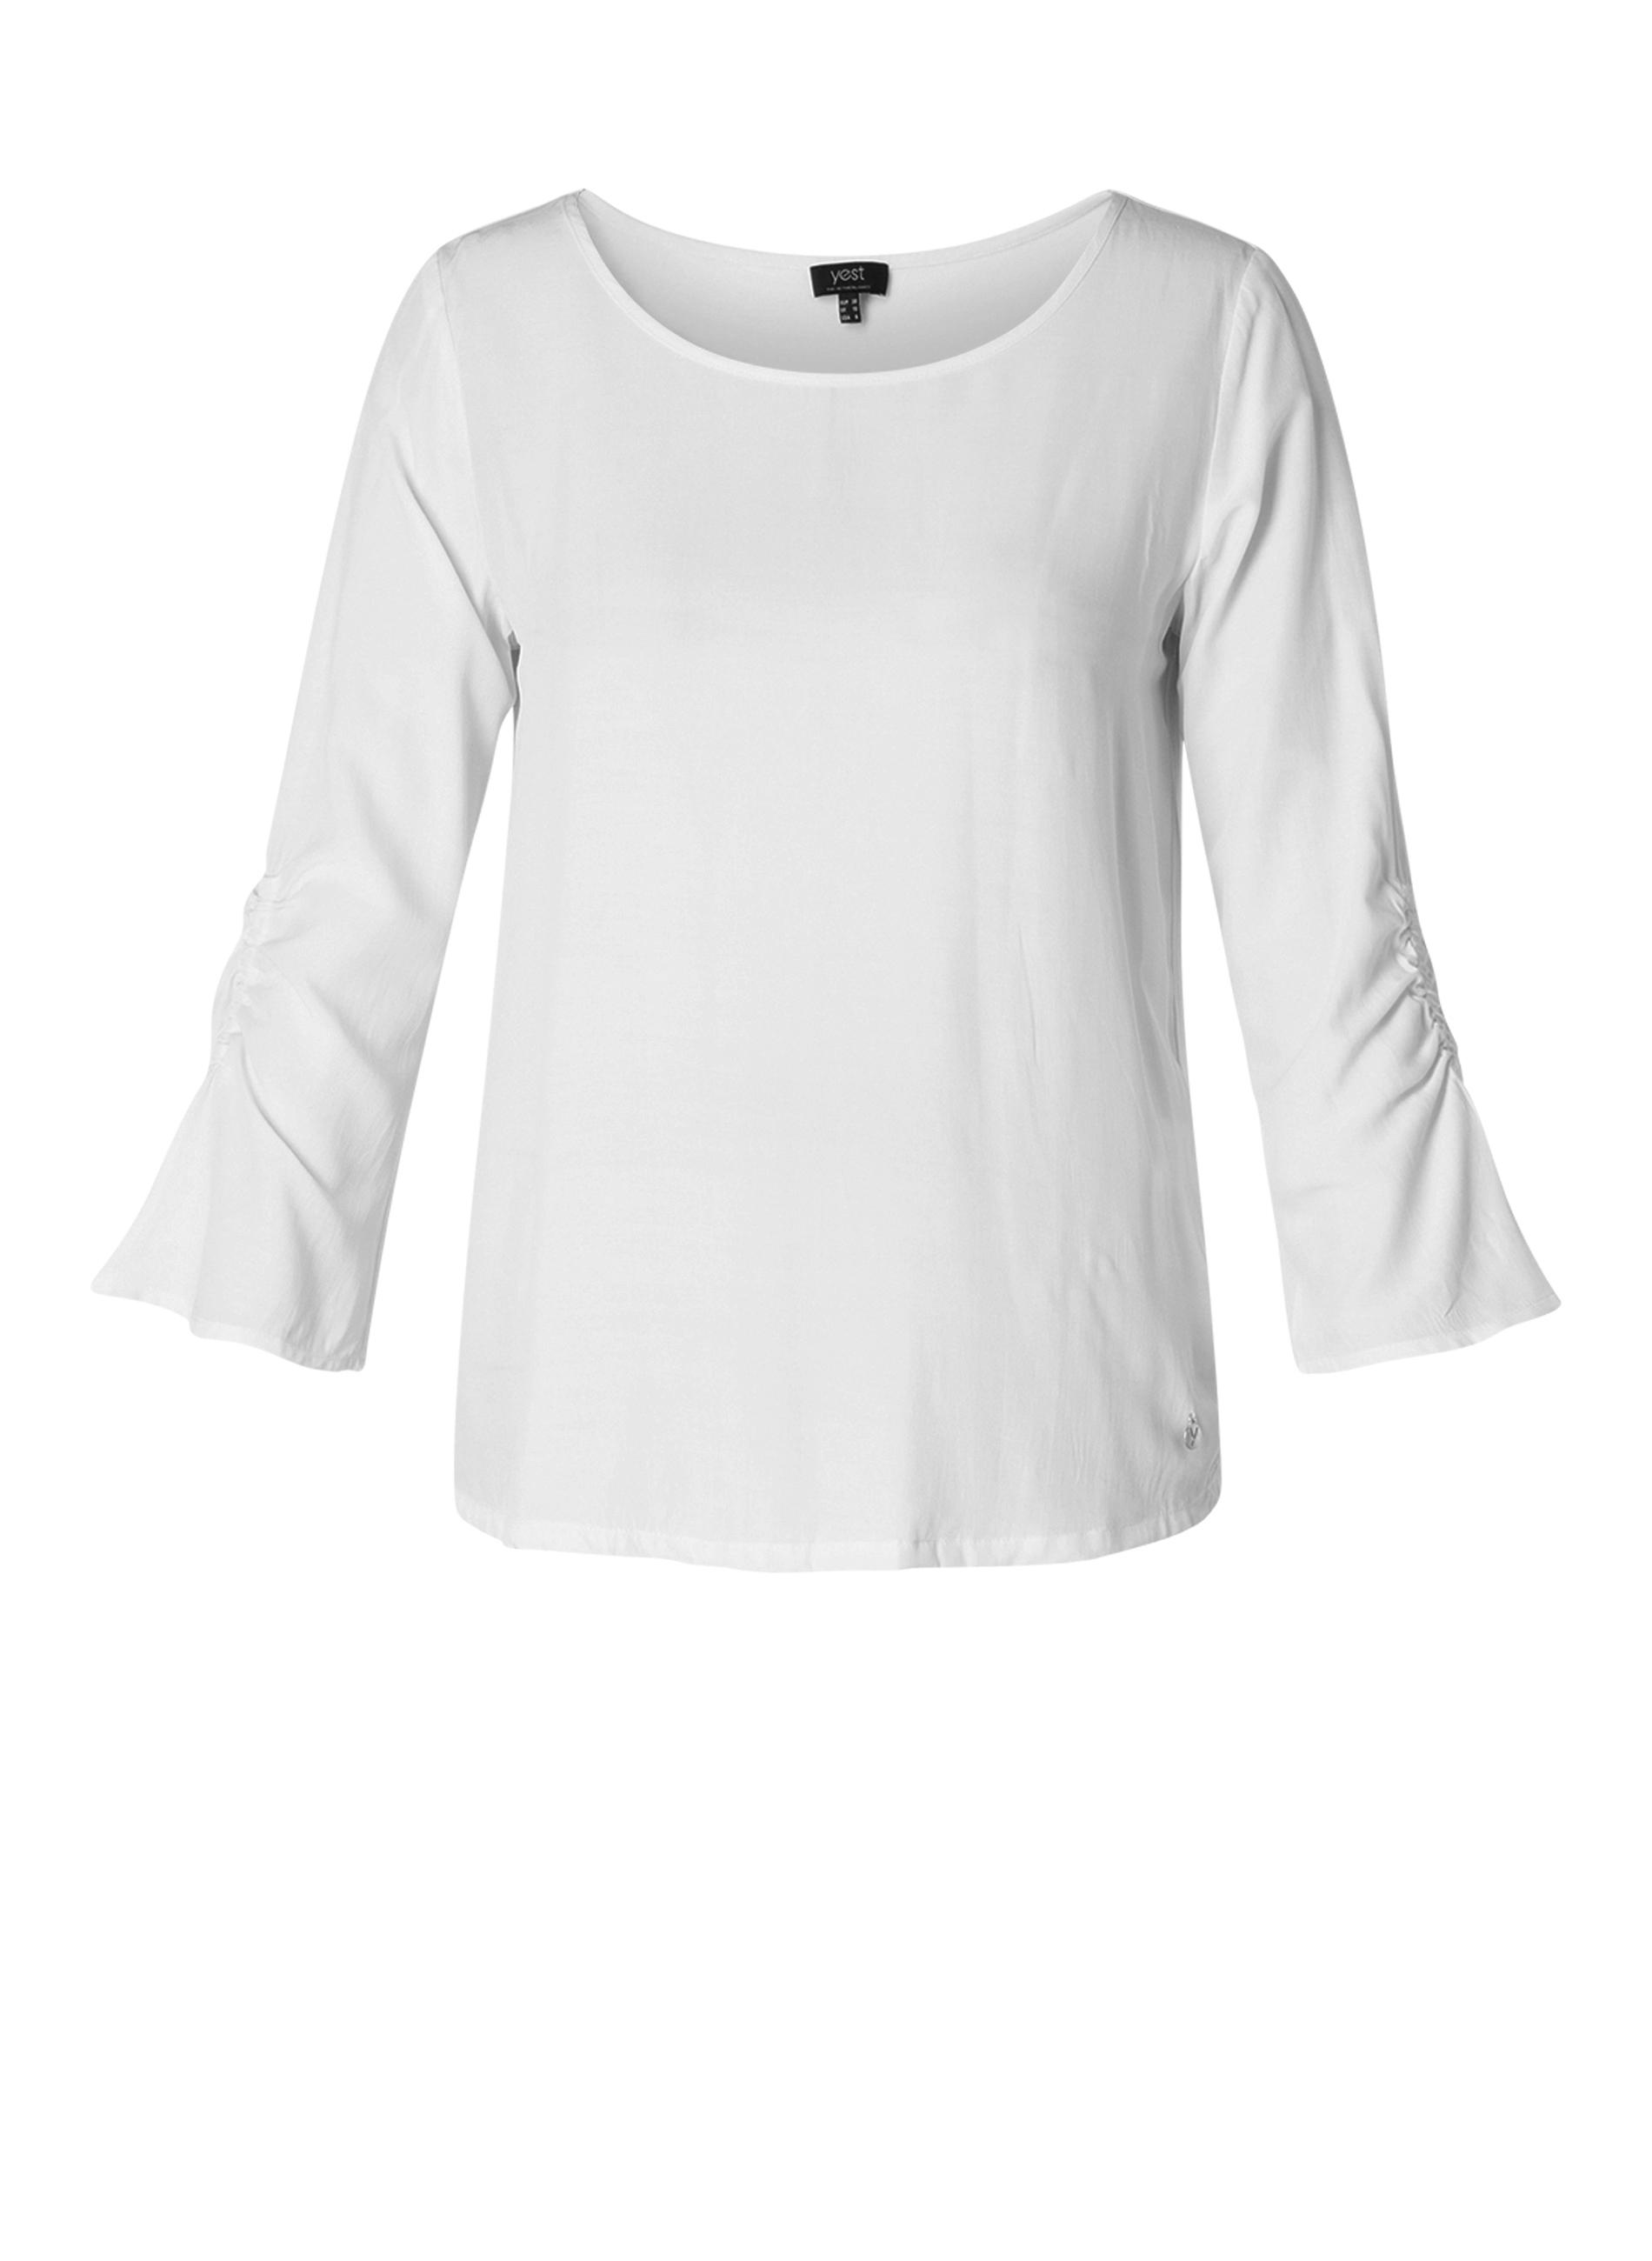 Yest blouse Irena 65 cm